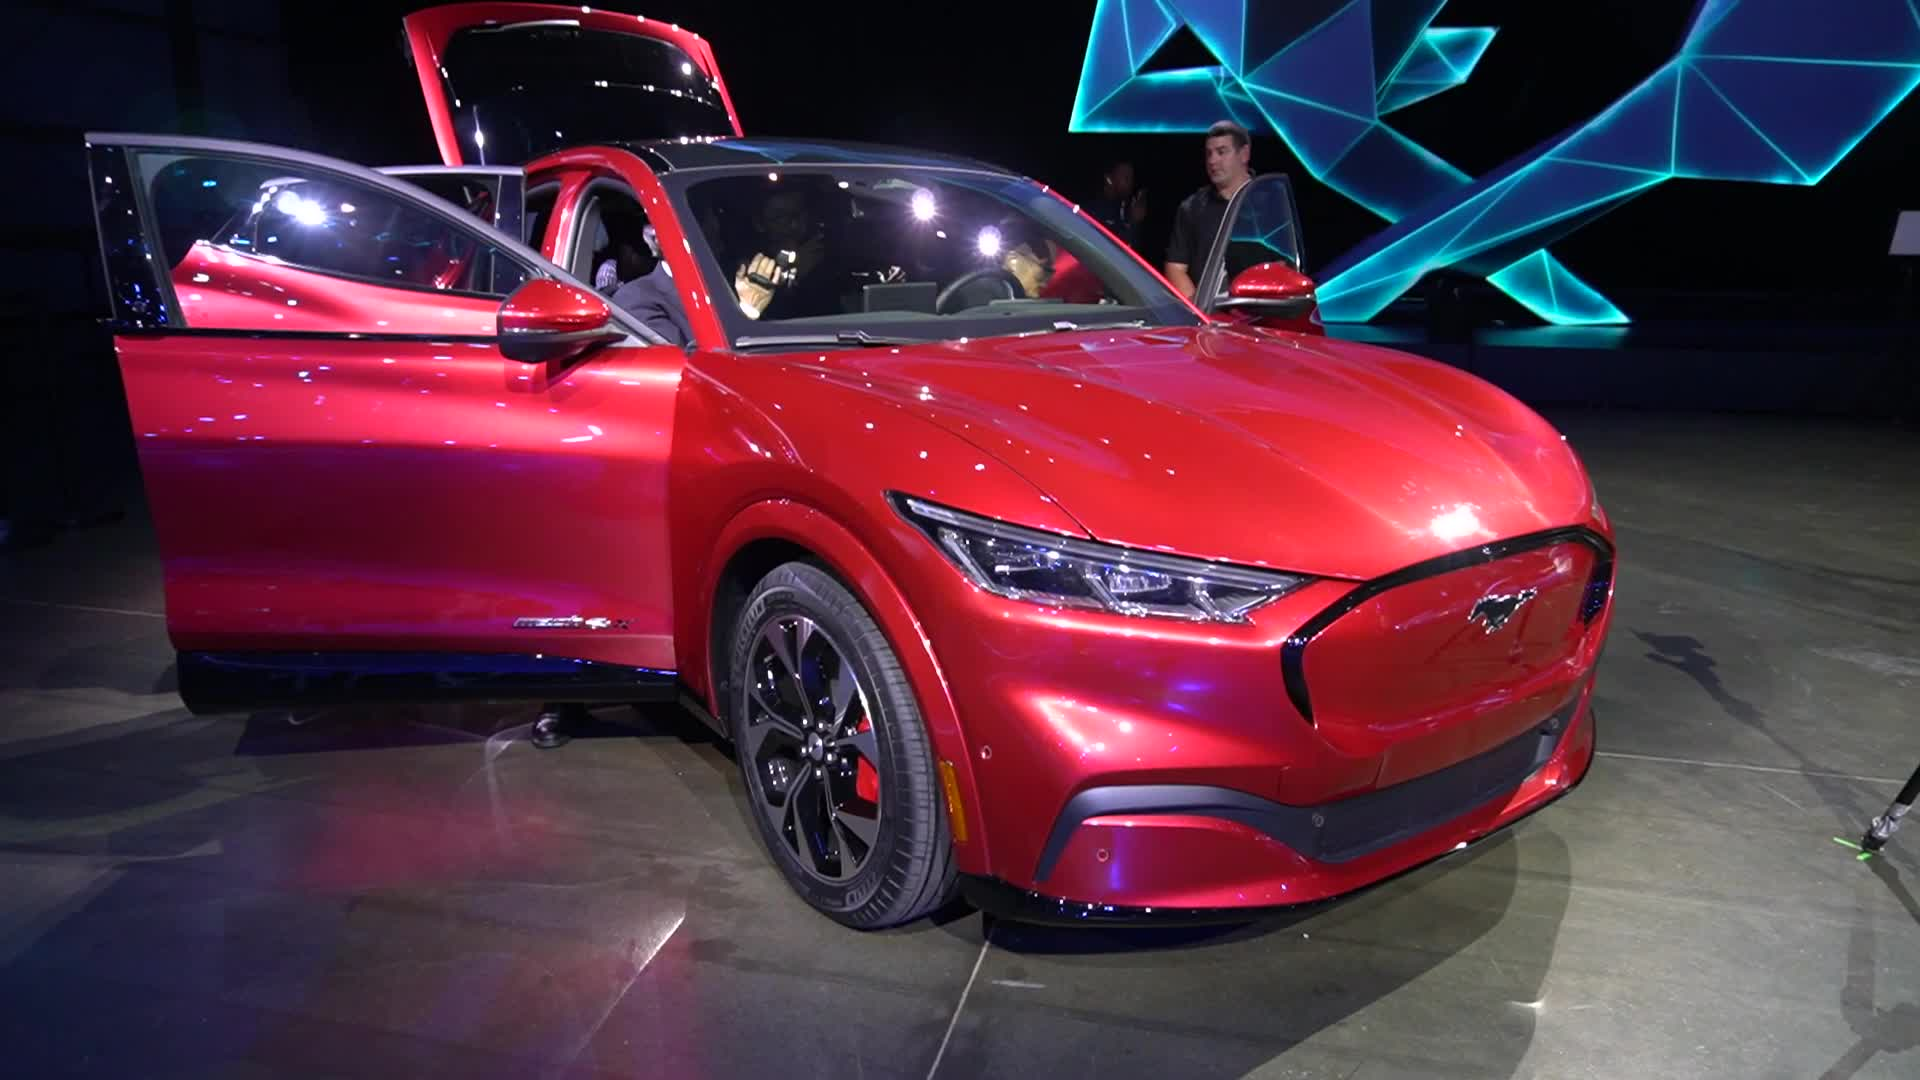 Auto, Autos, Elektroautos, NewGadgets, Elektromobilität, Johannes Knapp, Elektroauto, Ford, Fahrzeuge, Ford Mustang Mach-E, Ford Mustang